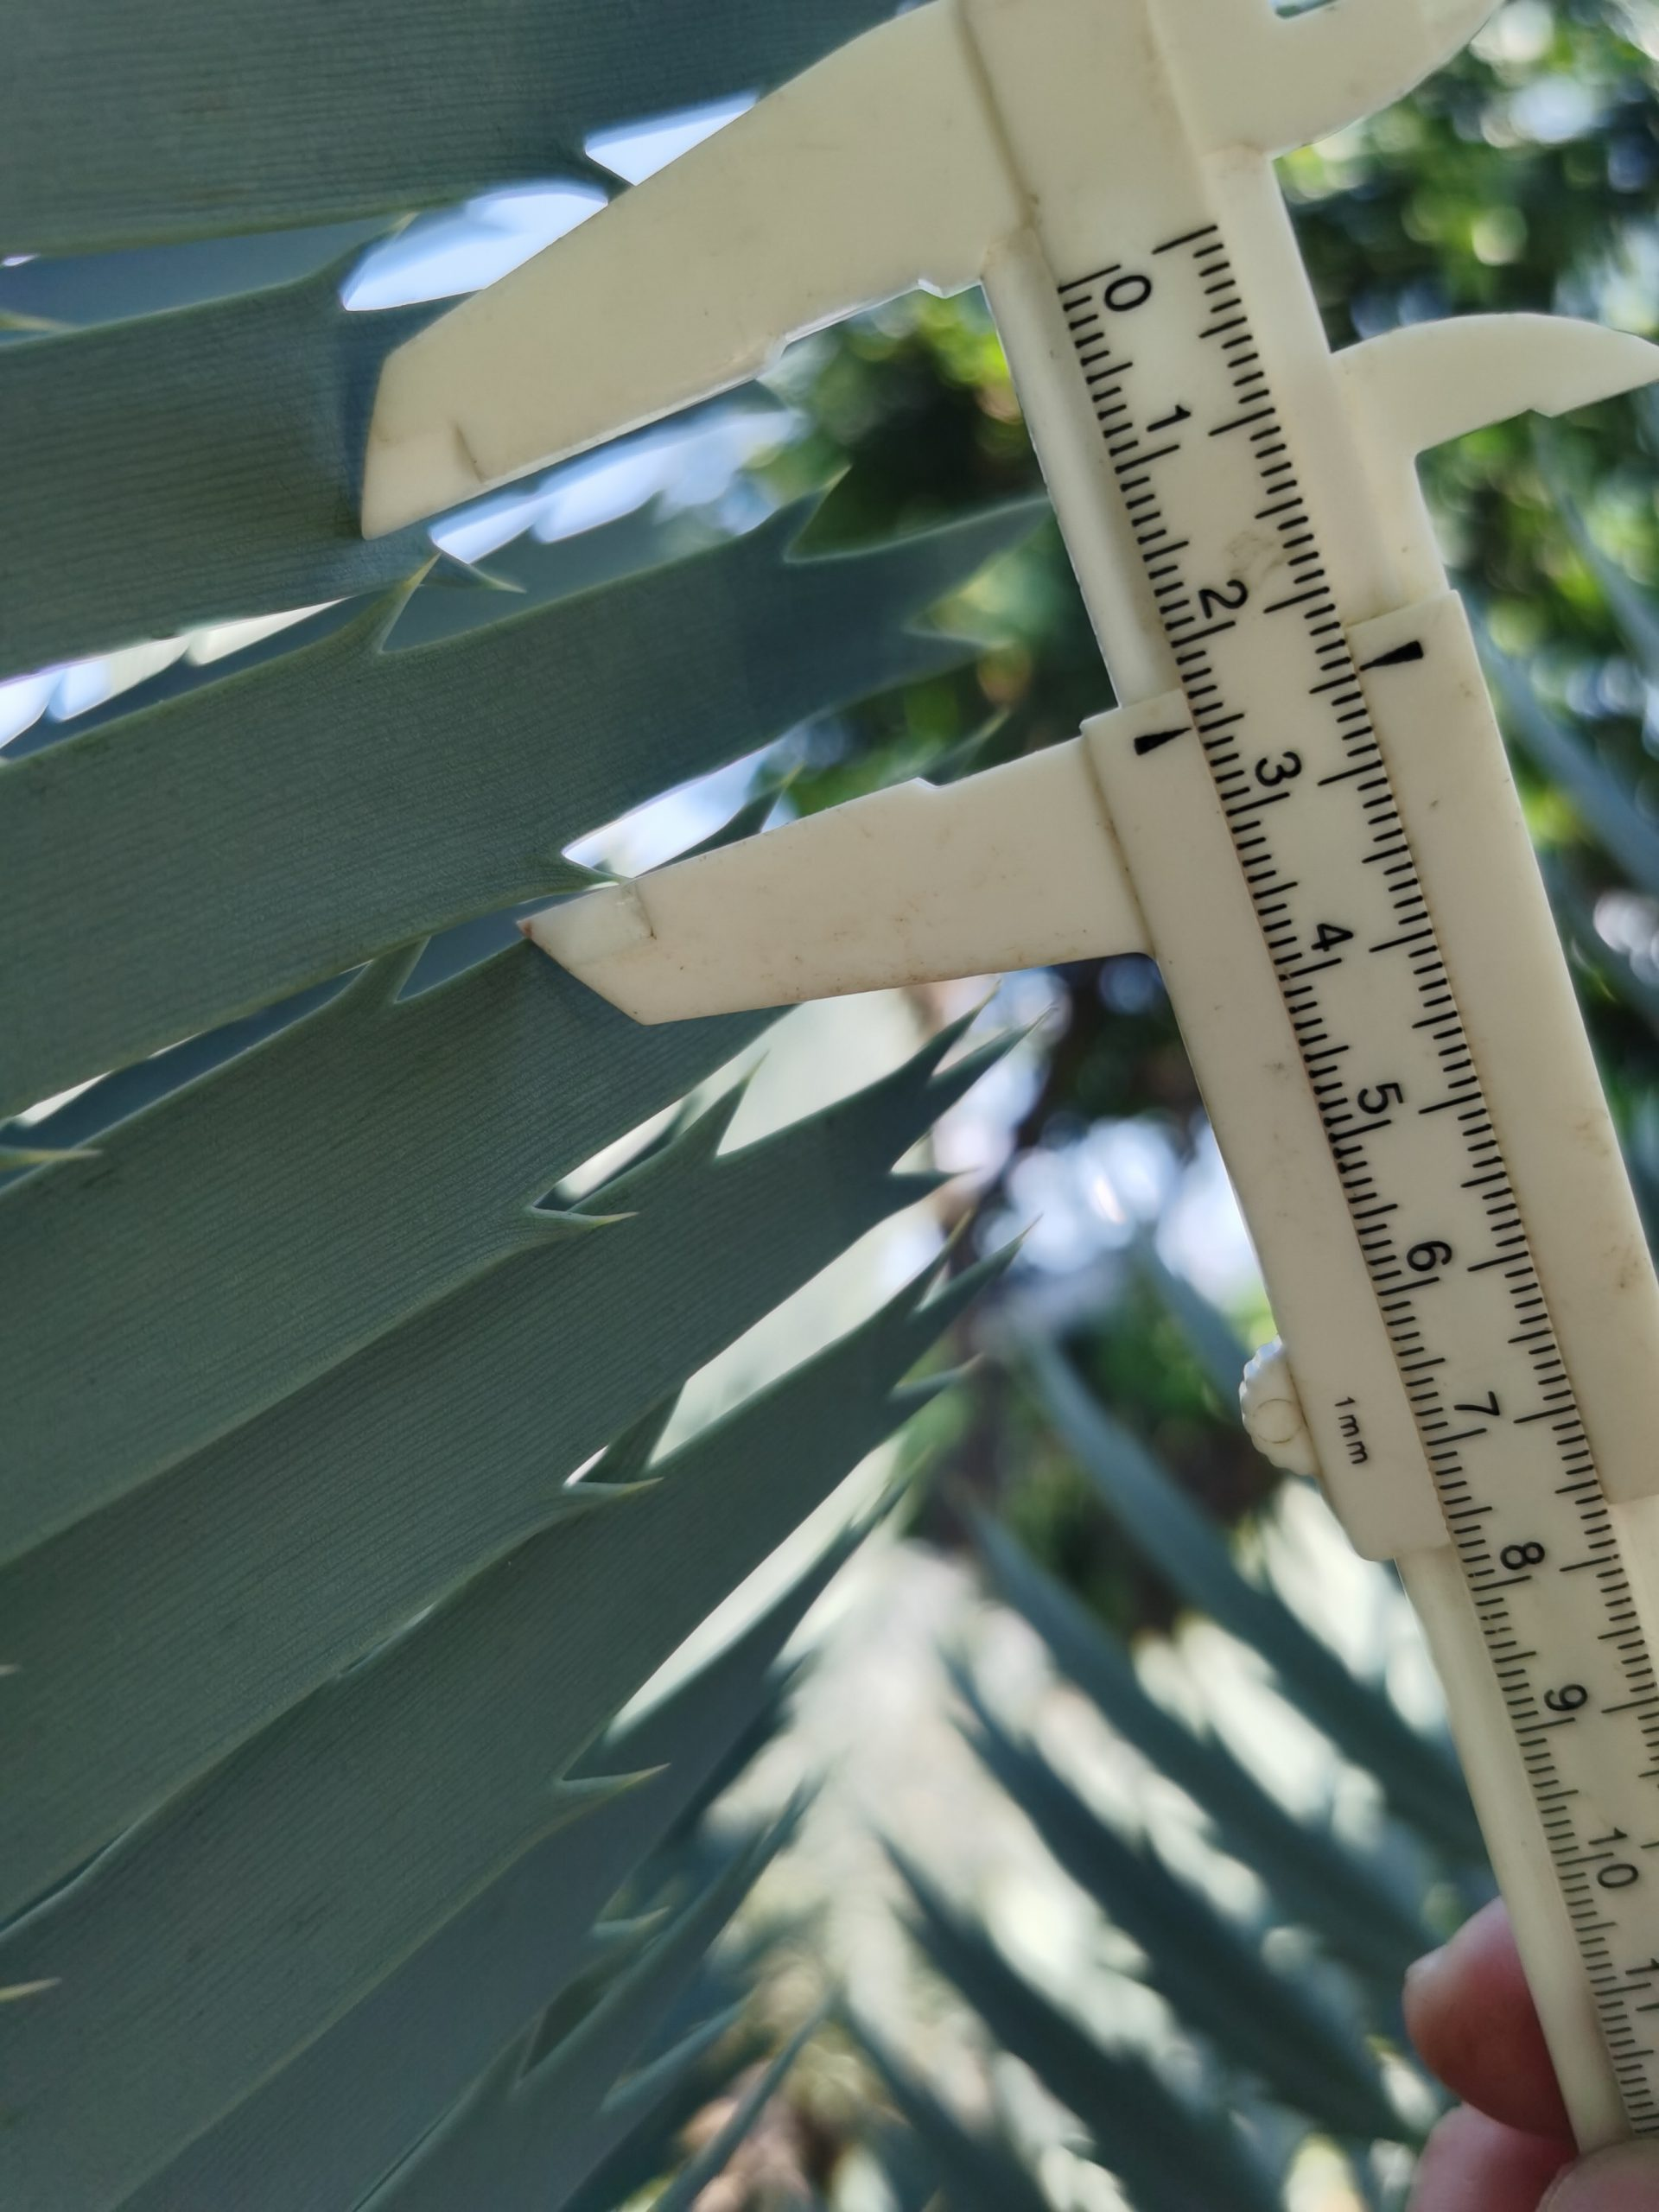 Encephalartos nubimontanus robusta